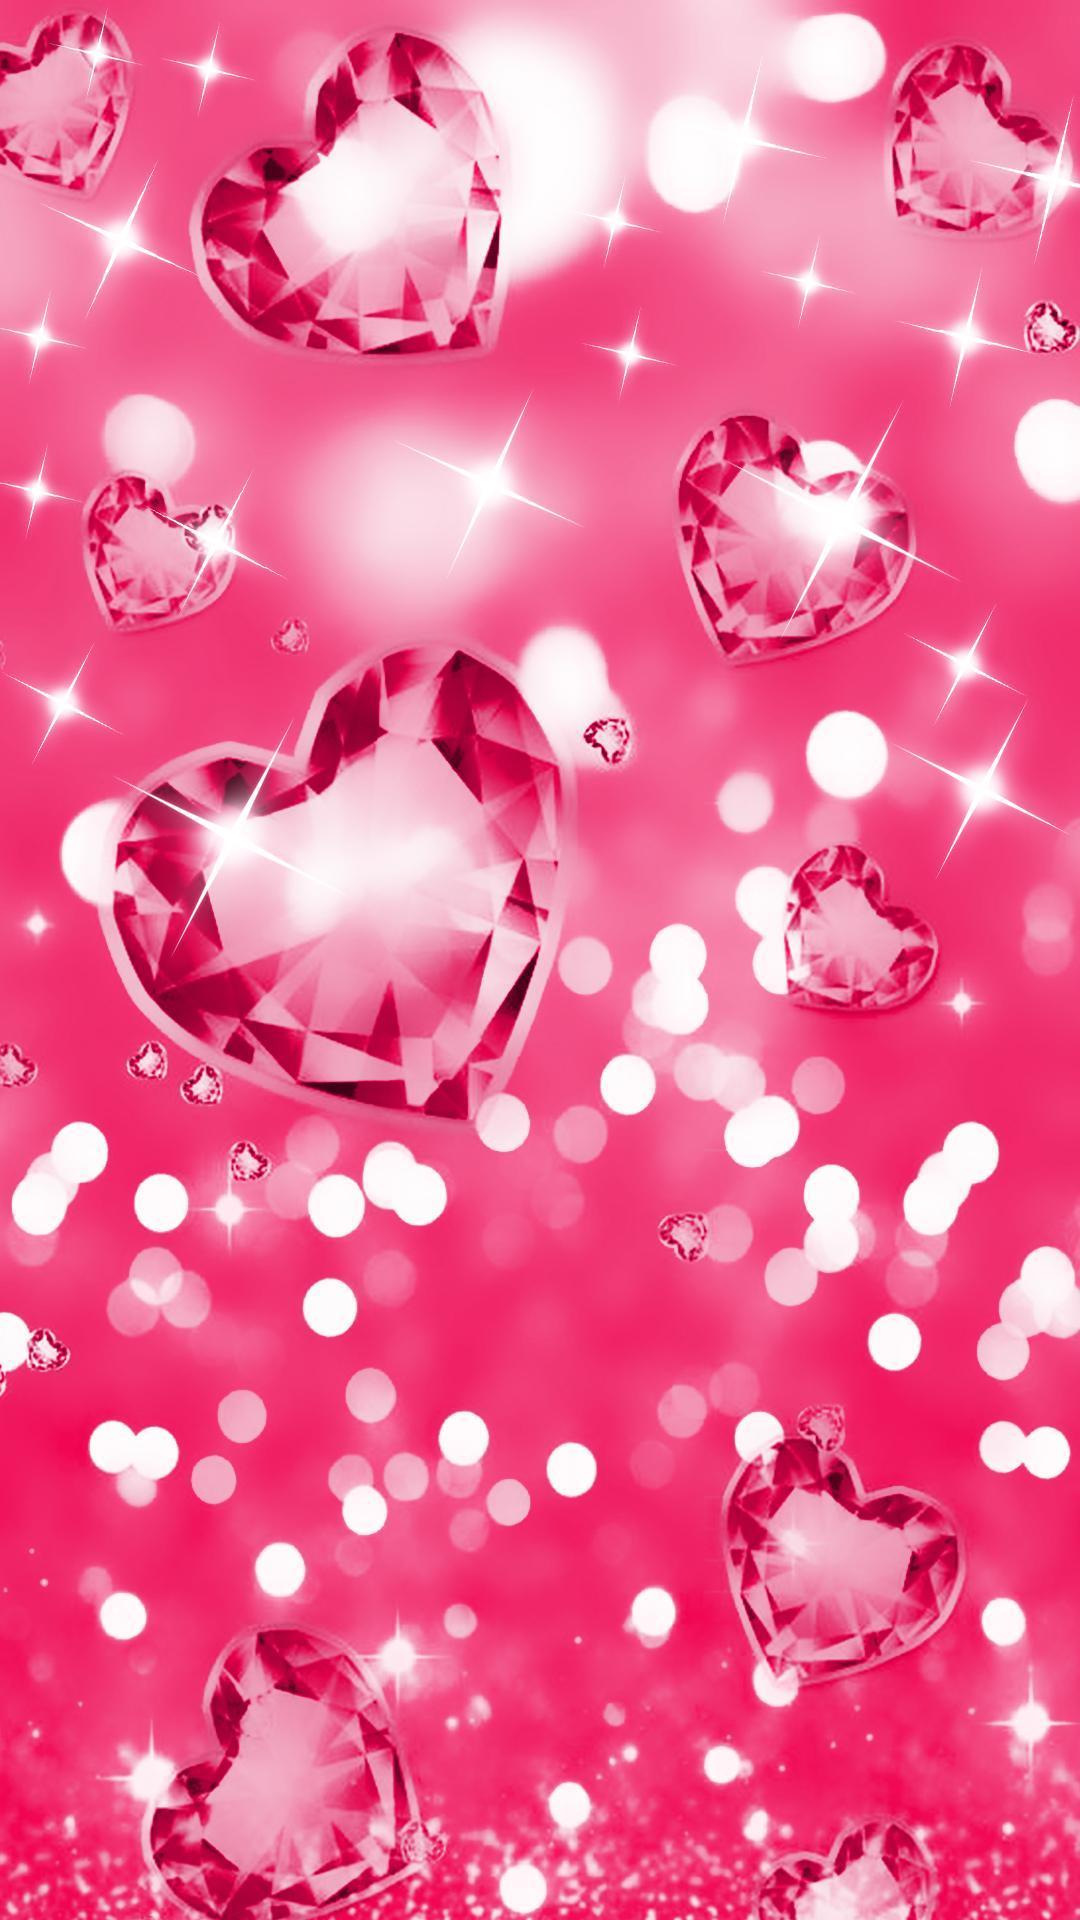 Bling Bling Diamond Apus Live Wallpaper For Android Apk